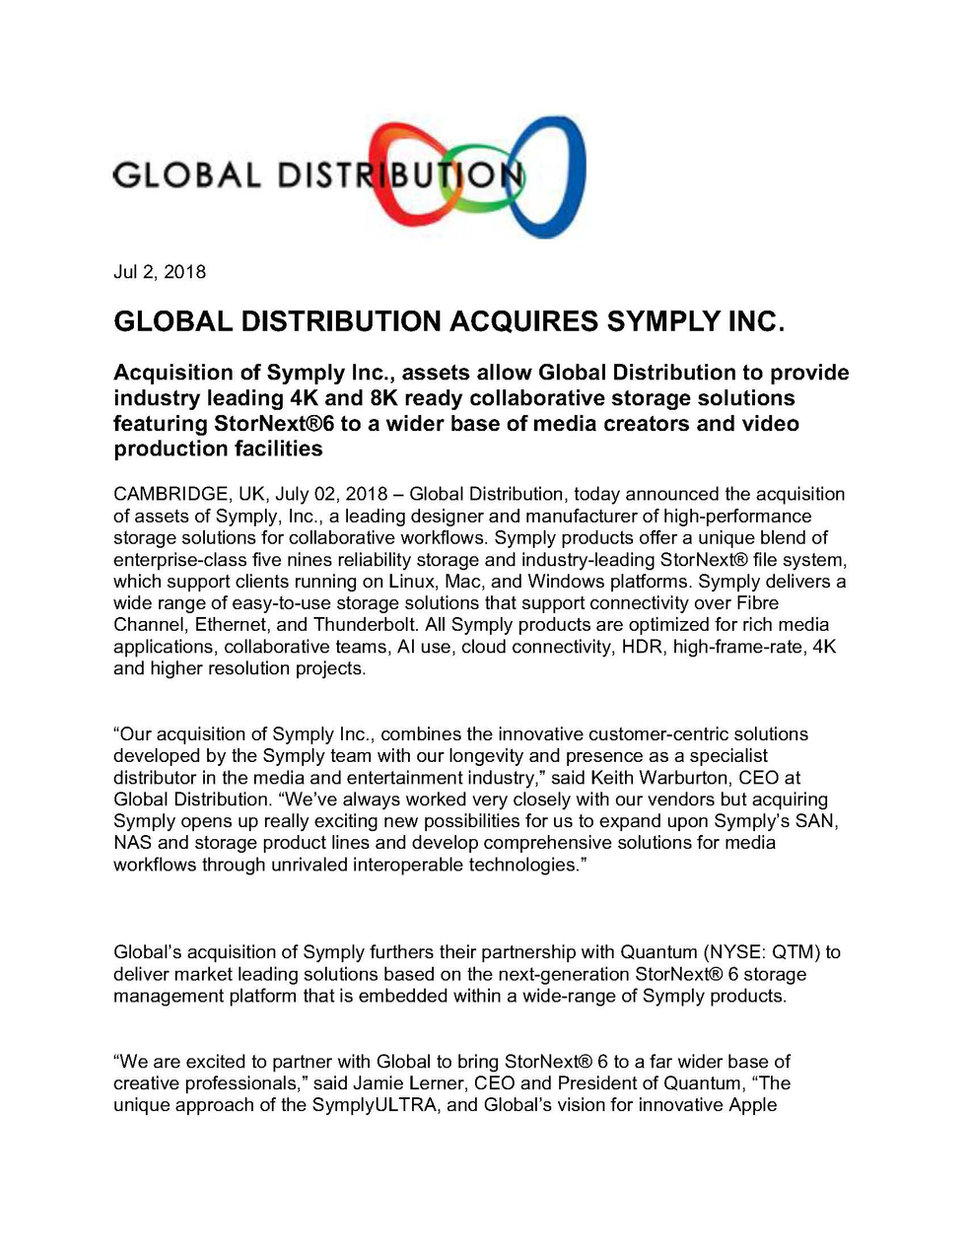 Global Acquires FINAL1.jpg